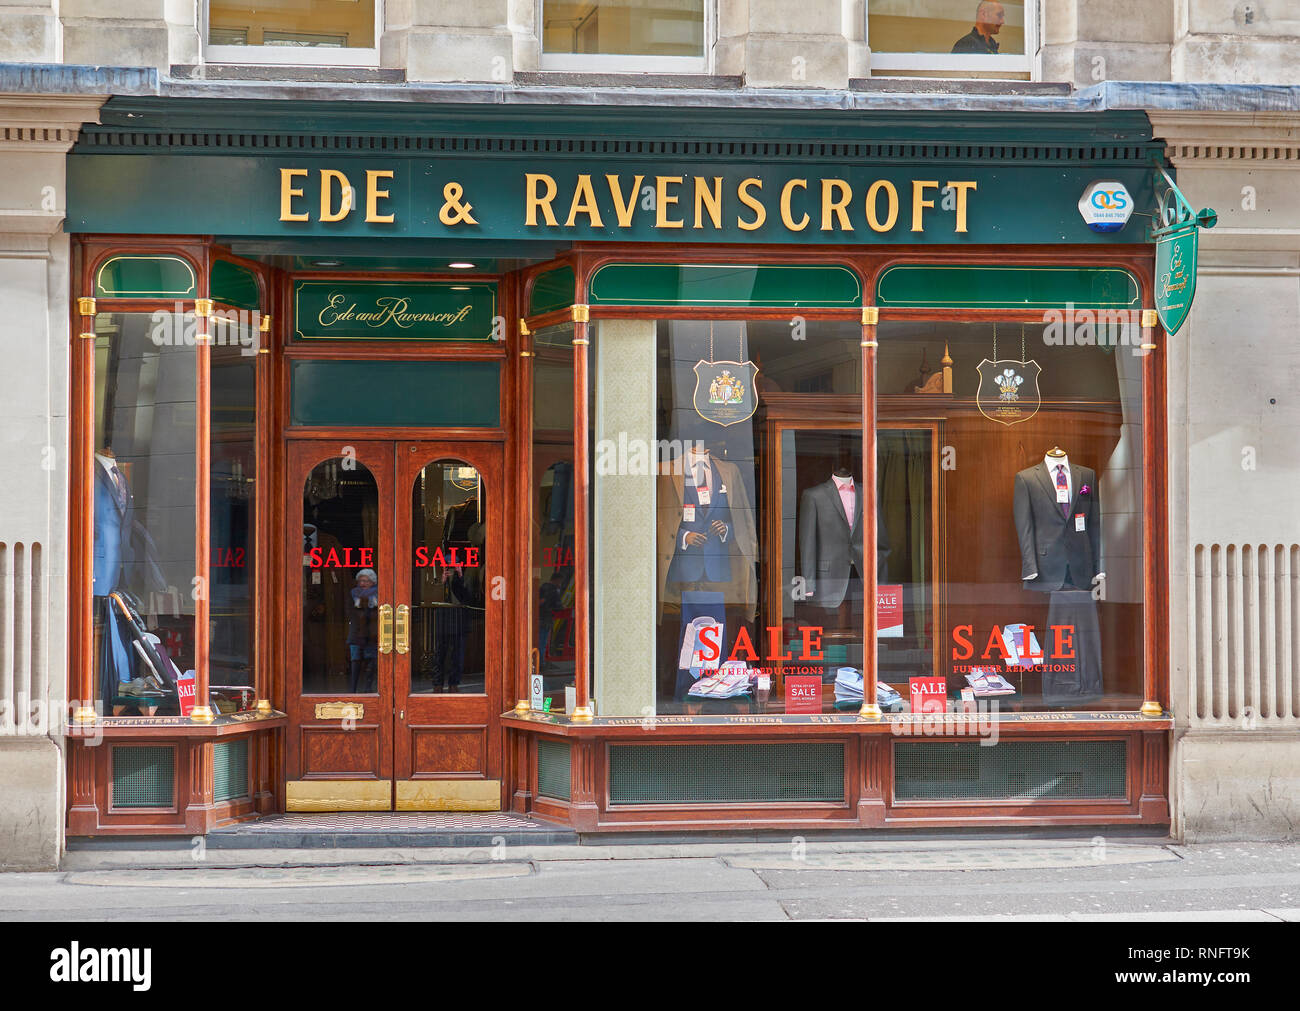 LONDON THE CITY OF LONDON EDE & RAVENSCROFT 2 GRACECHURCH STREET LONDONS OLDEST ROBE MAKER - Stock Image